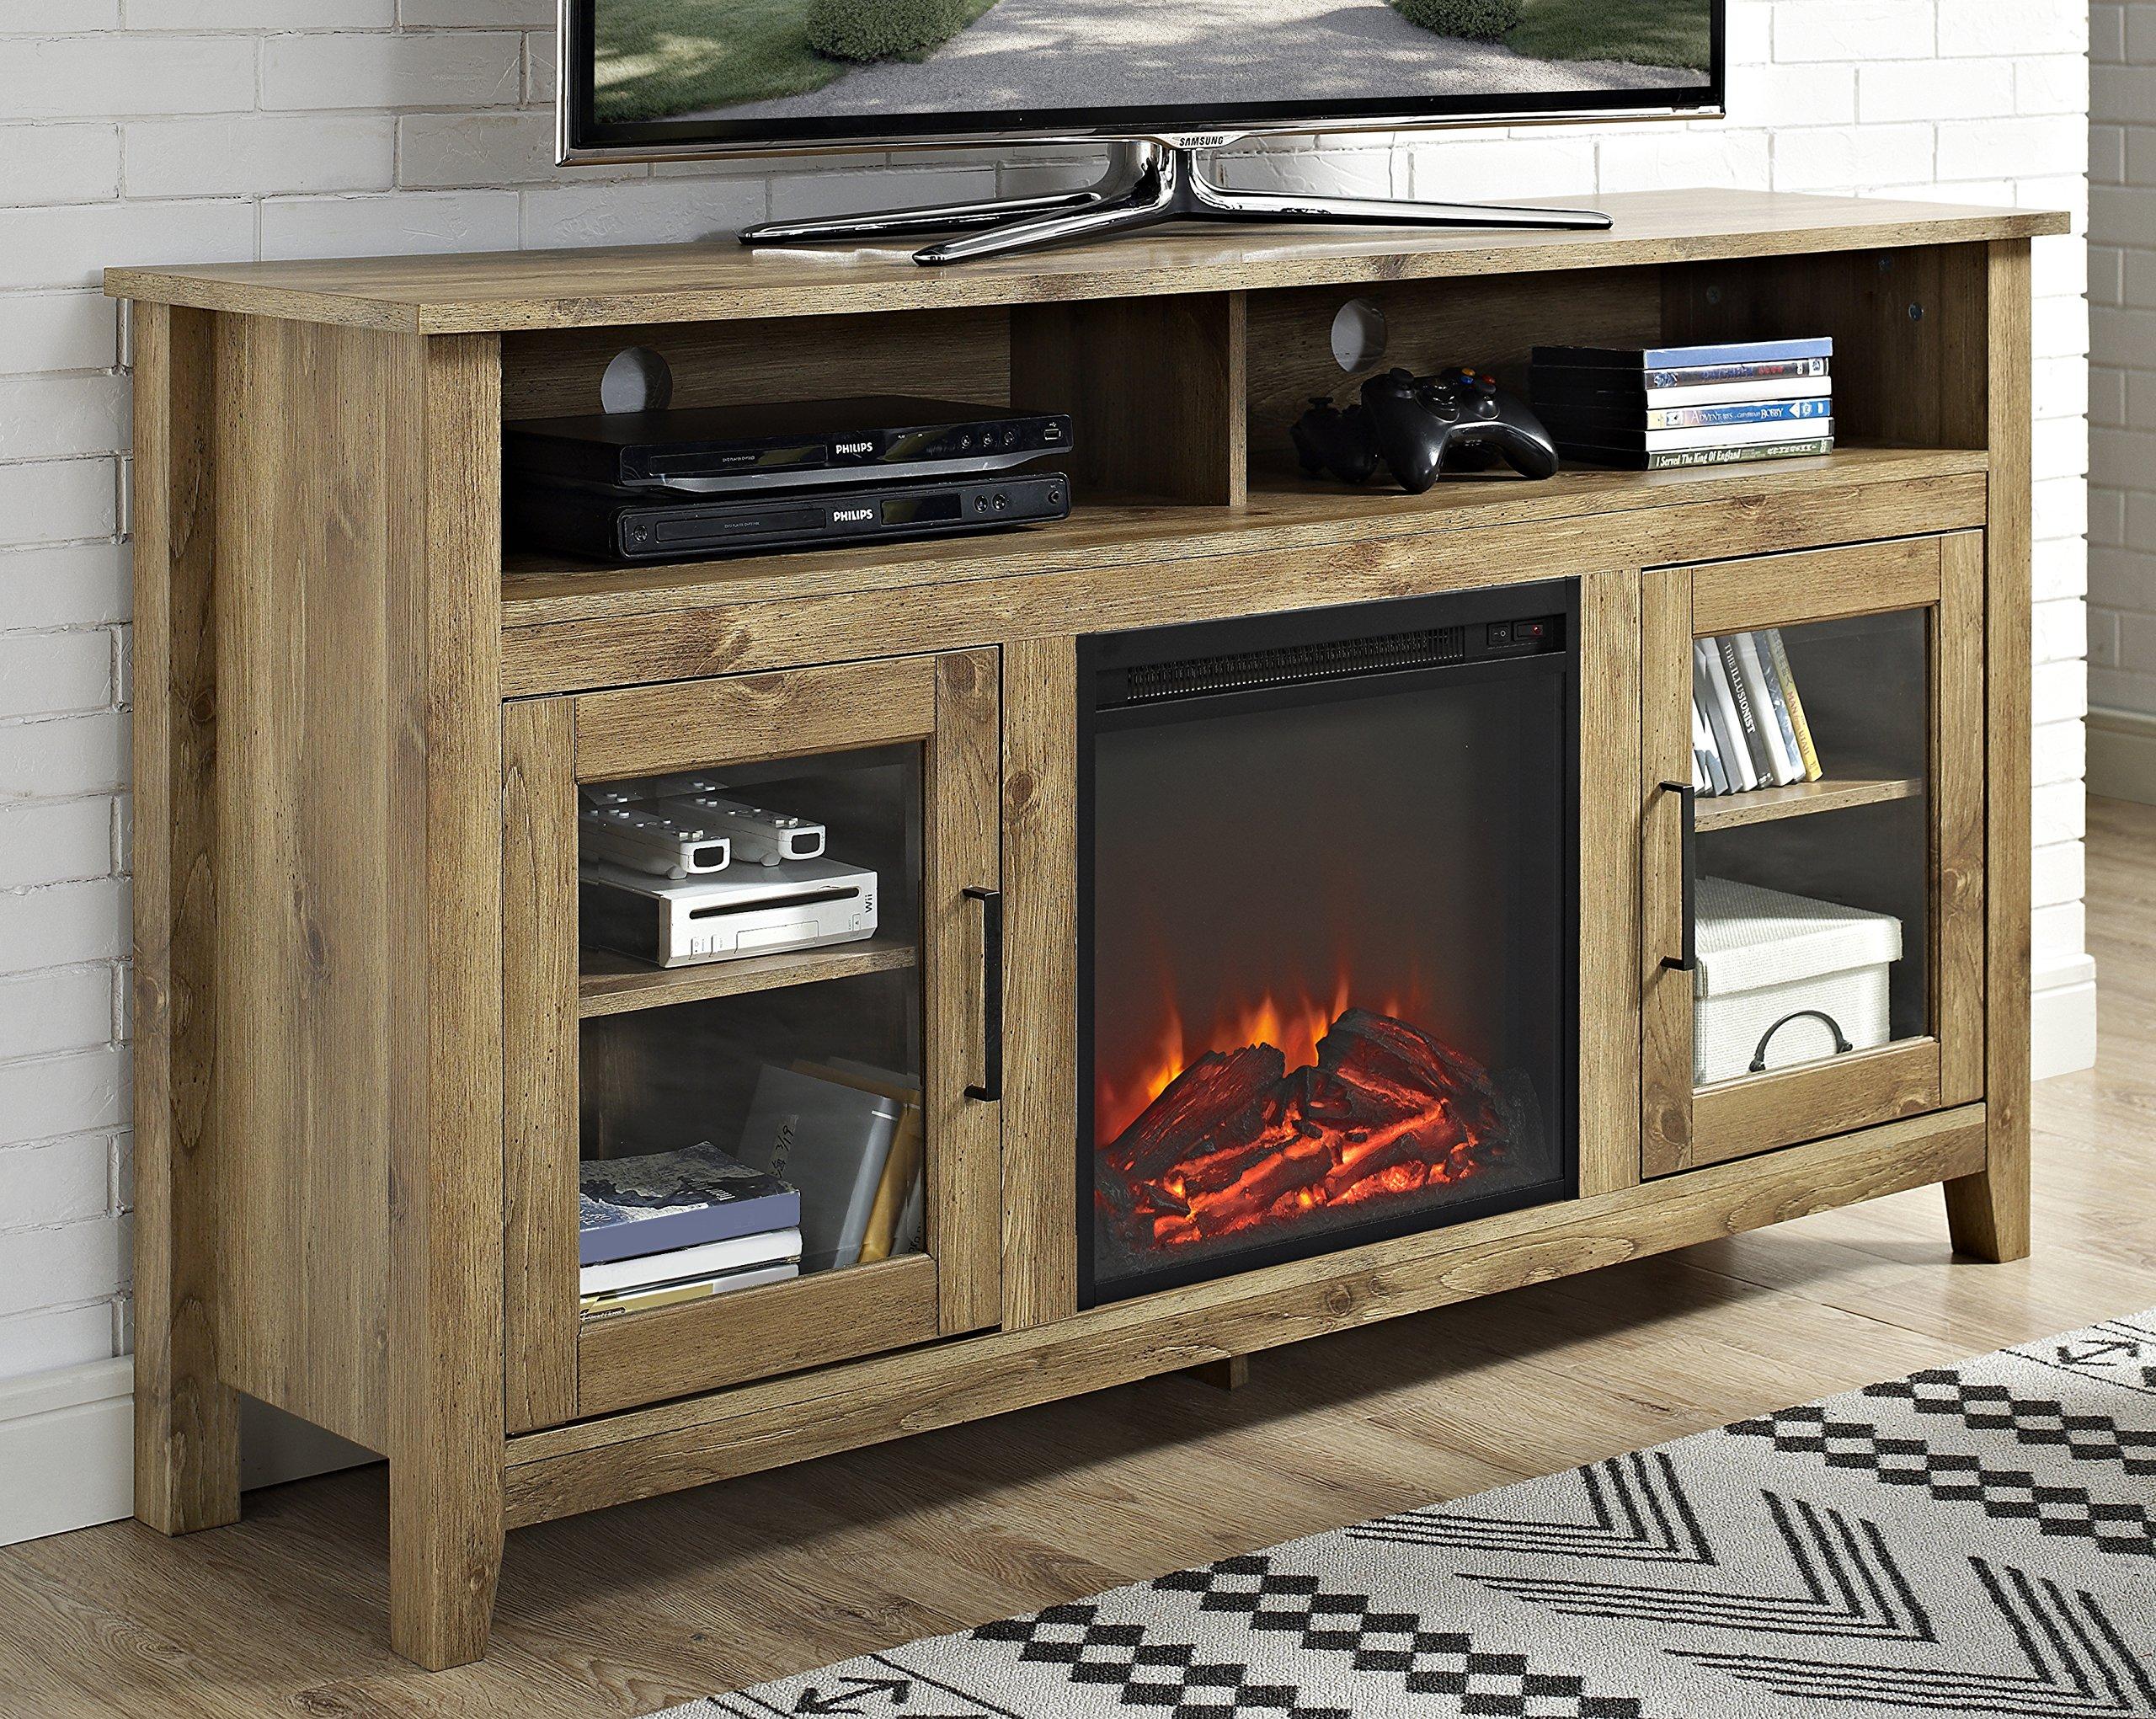 WE Furniture 58'' Wood Highboy Fireplace Media TV Stand Console - Barnwood